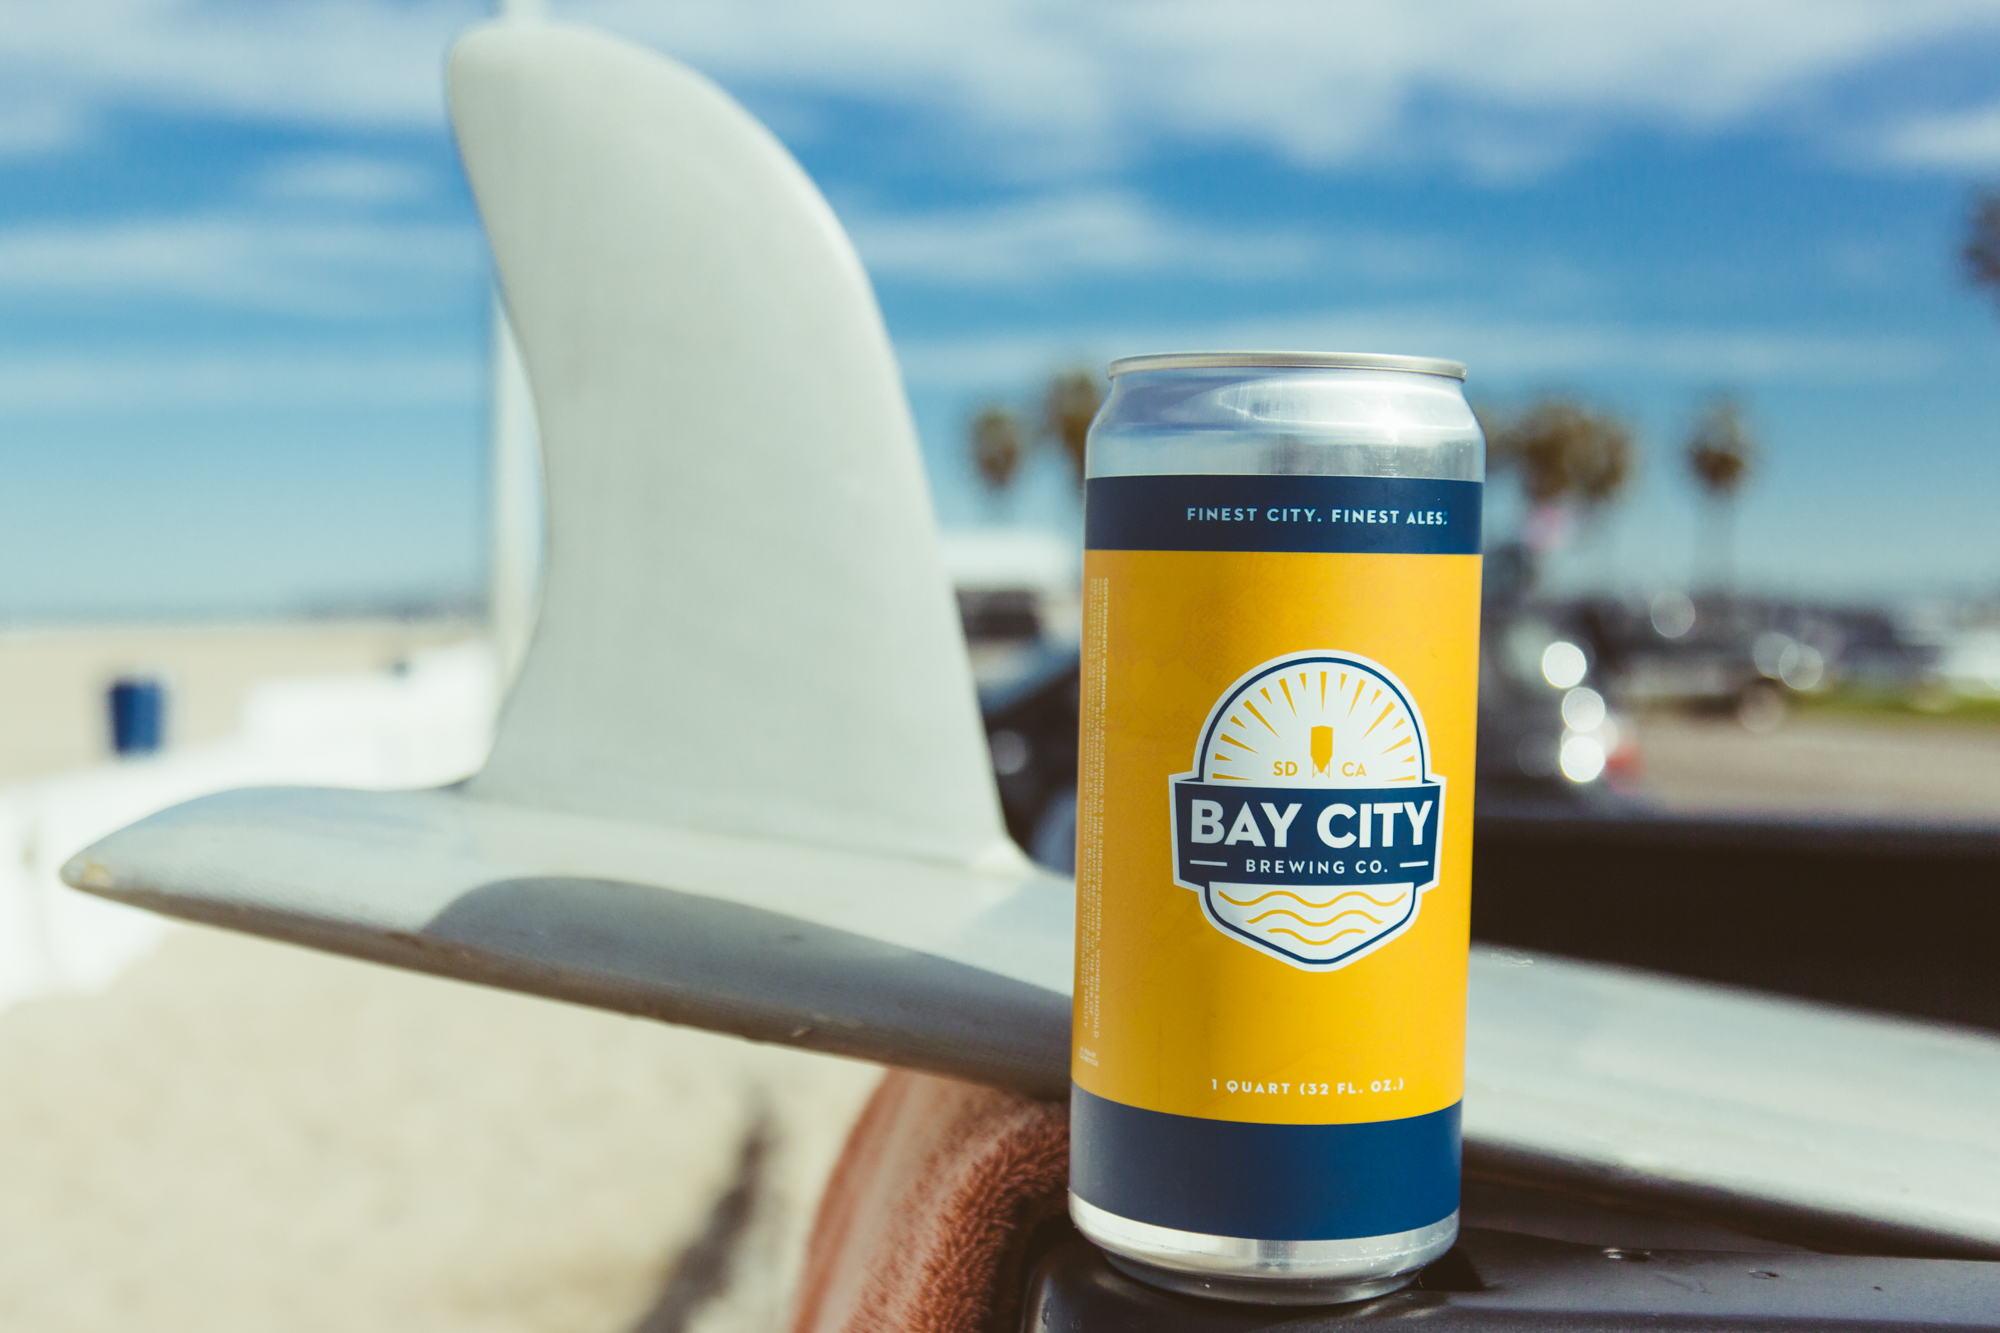 bay city-1677.JPG